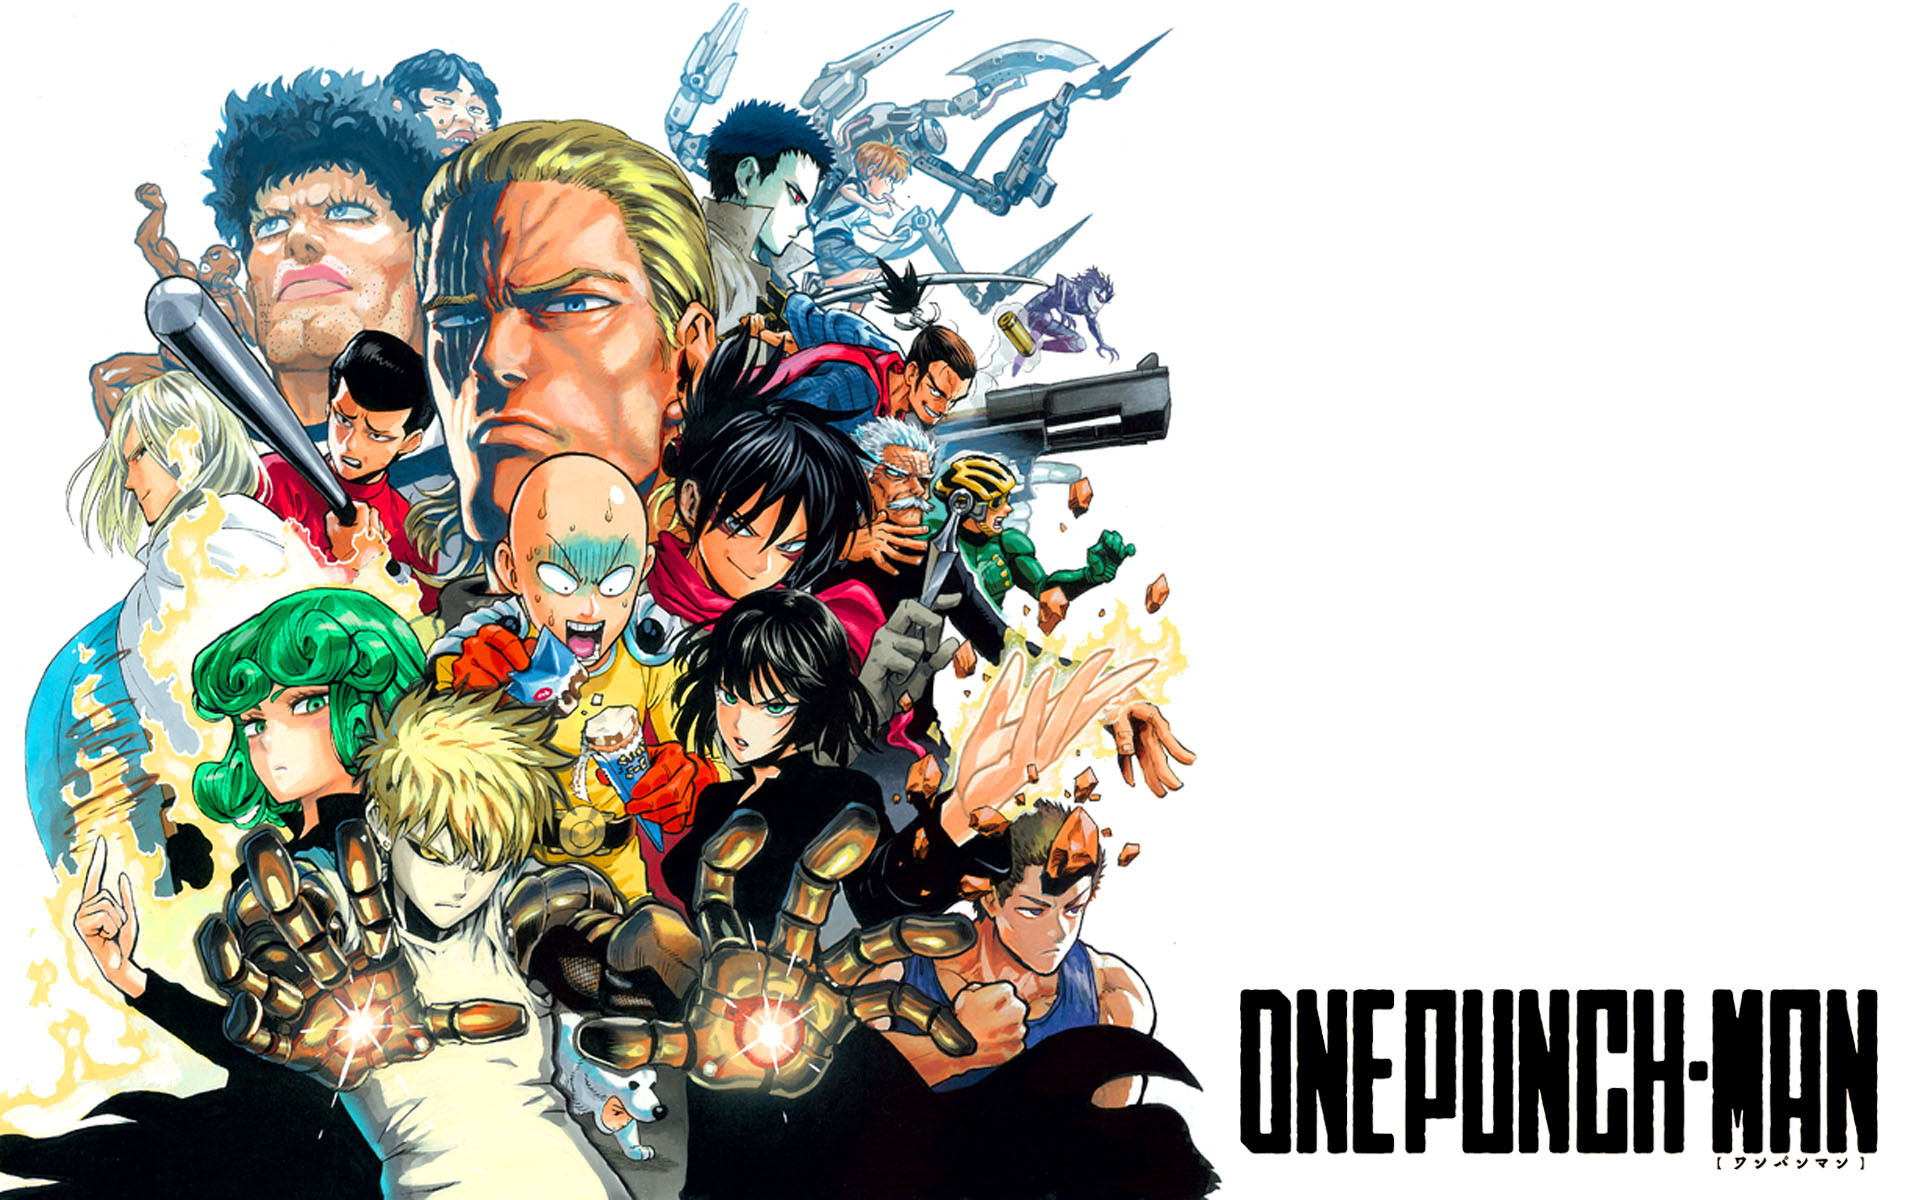 One Punch Man Wallpaper HD